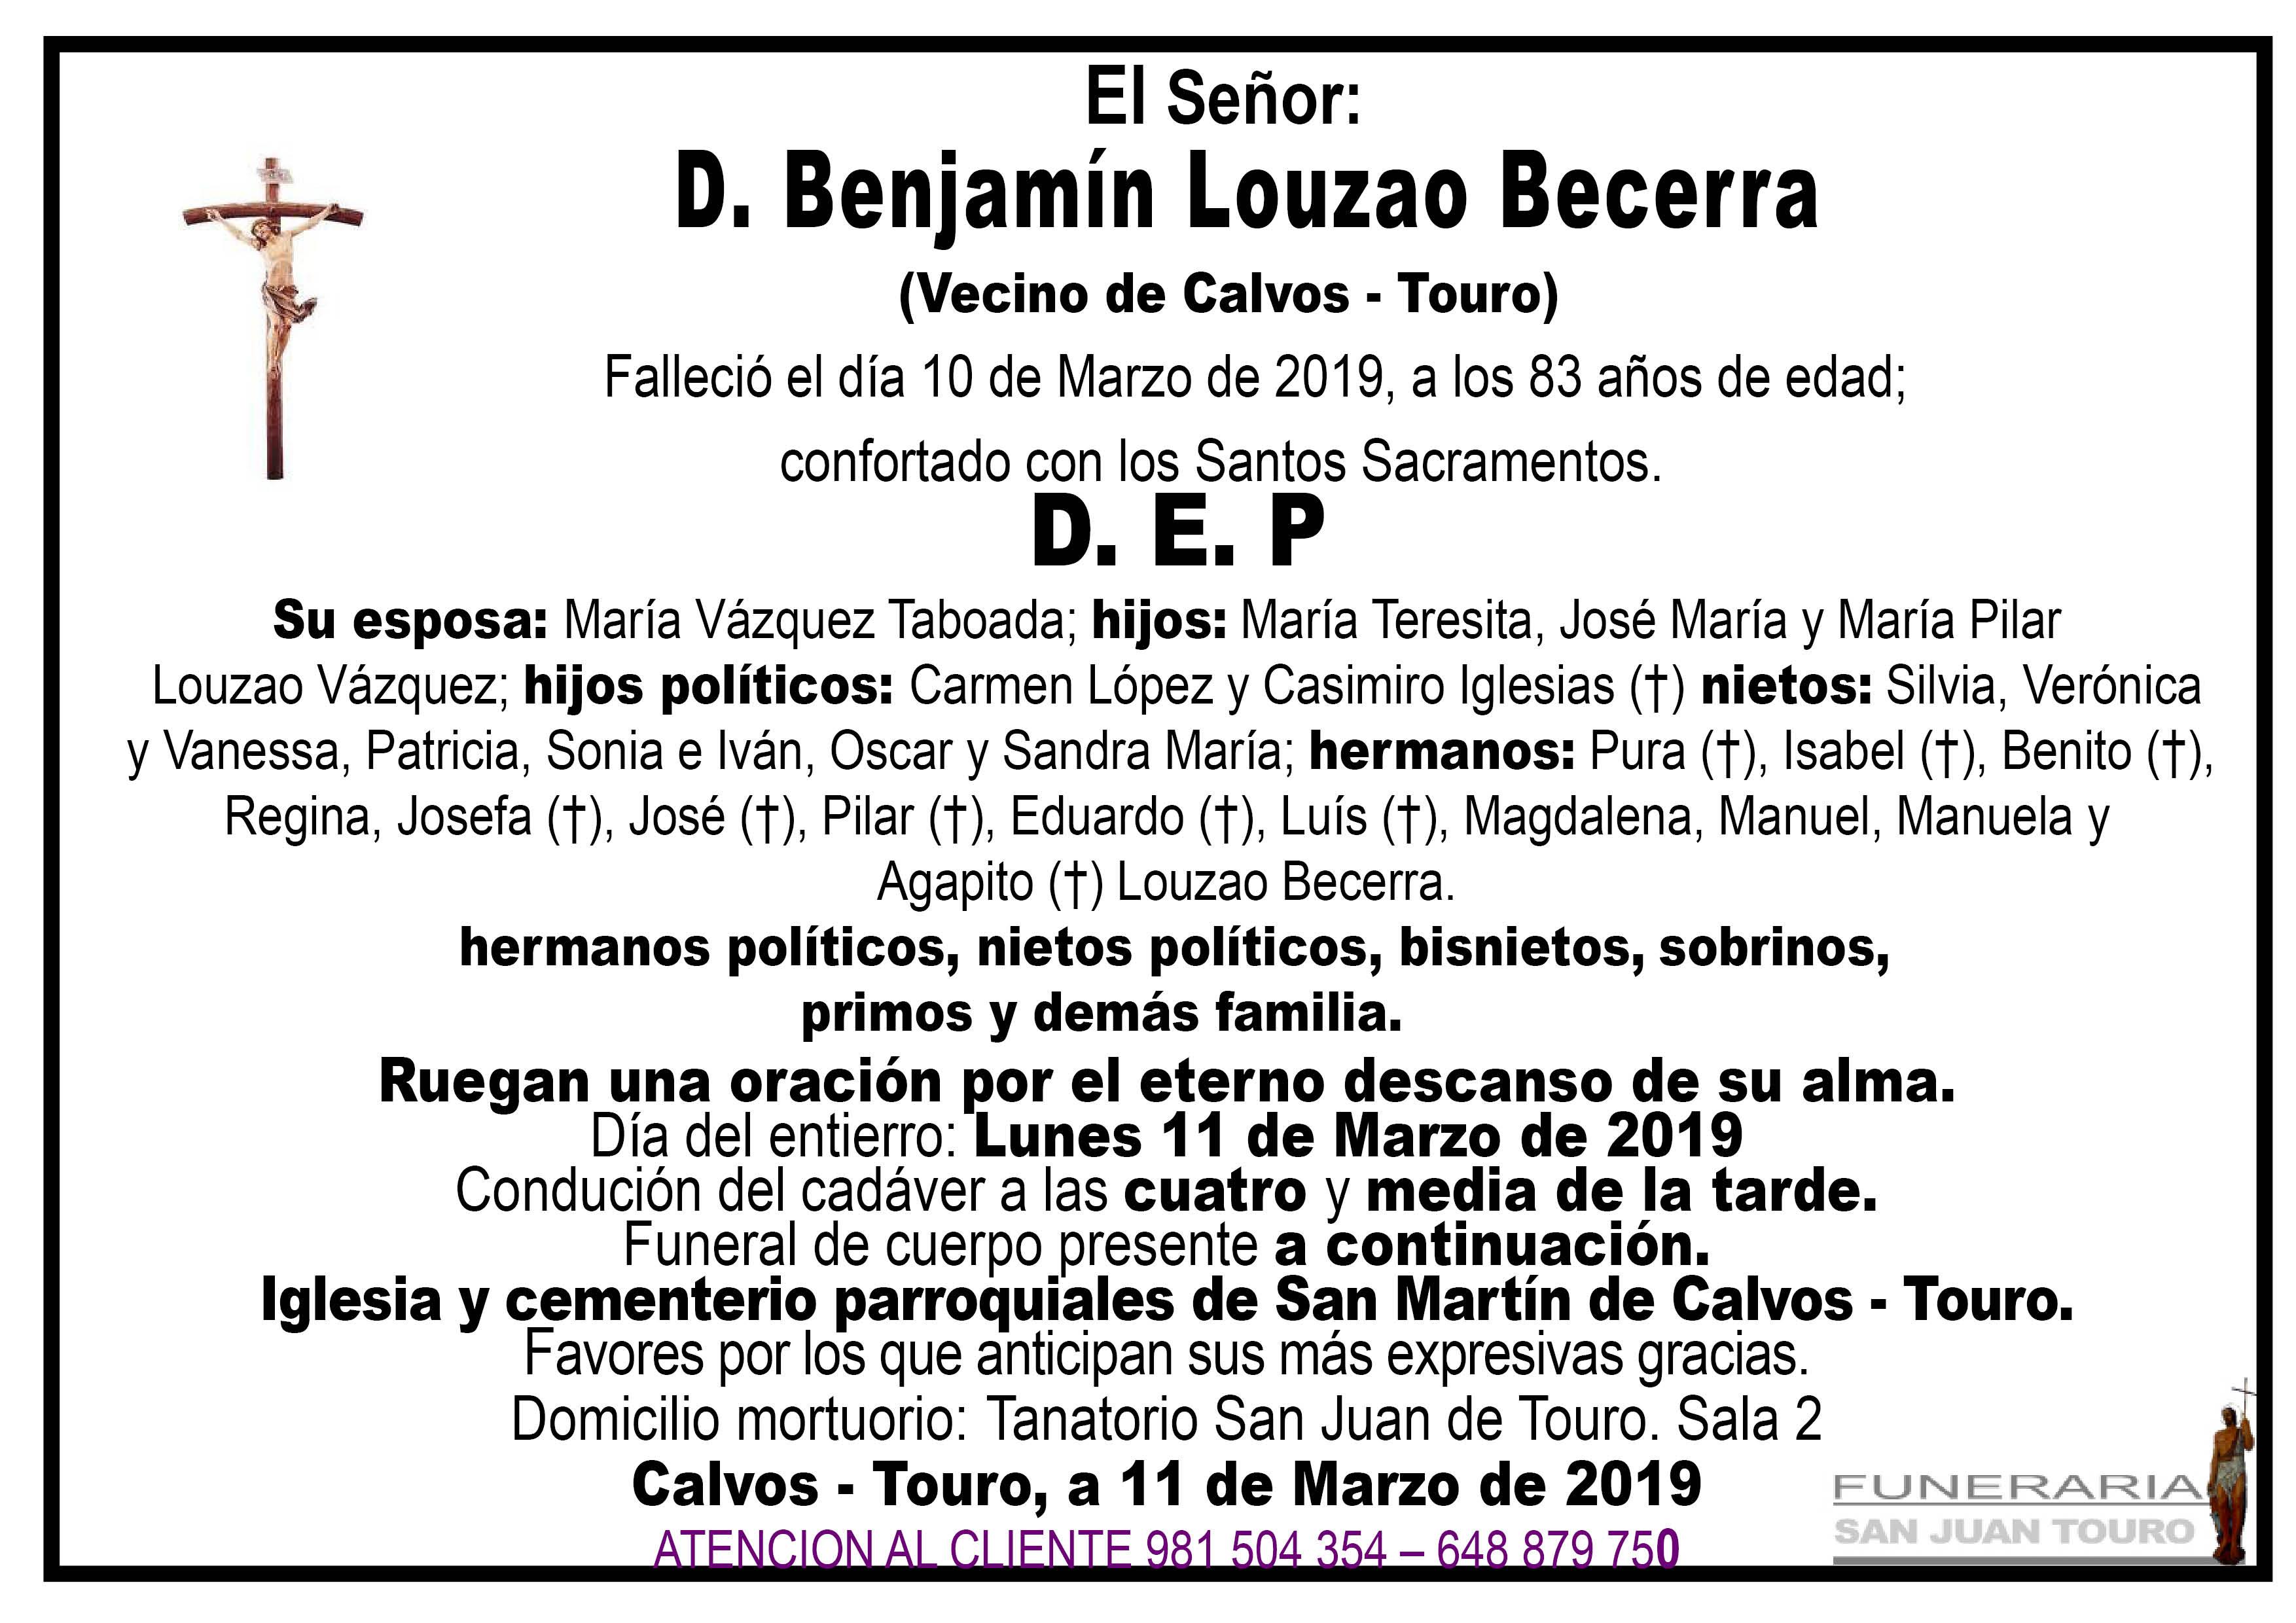 Esquela de SEPELIO DE DON BENJAMÍN LOUZAO BECERRA